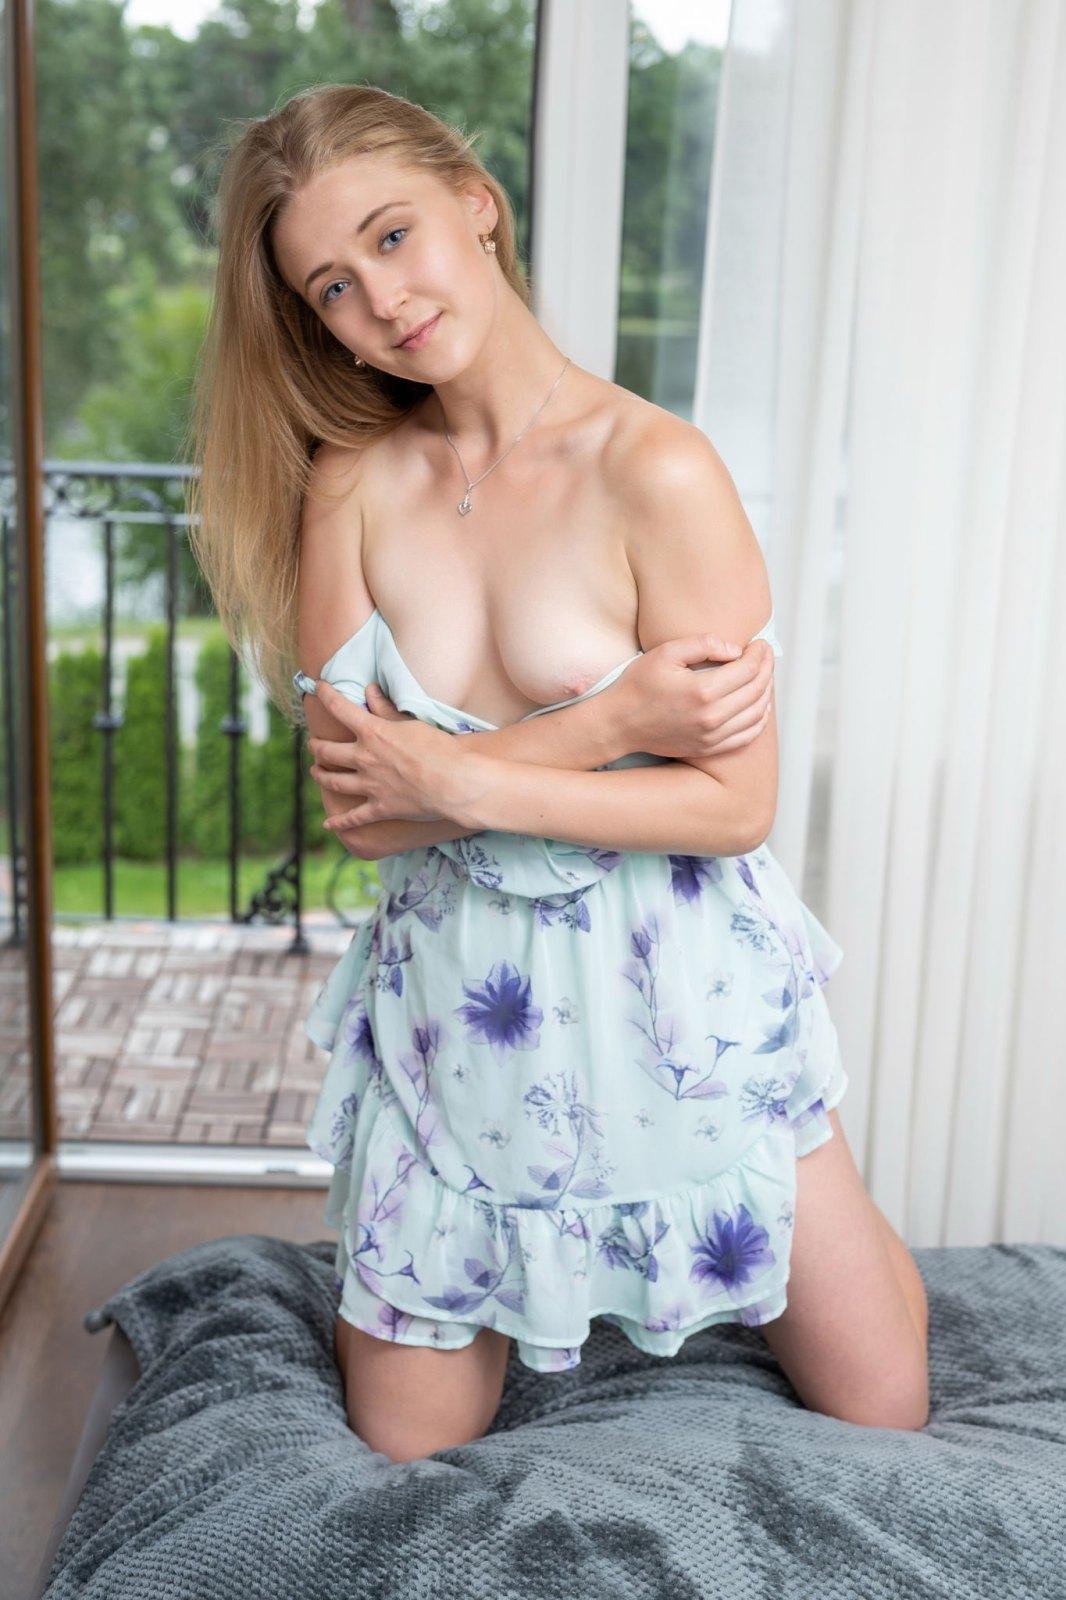 Sexy male cumshot pics